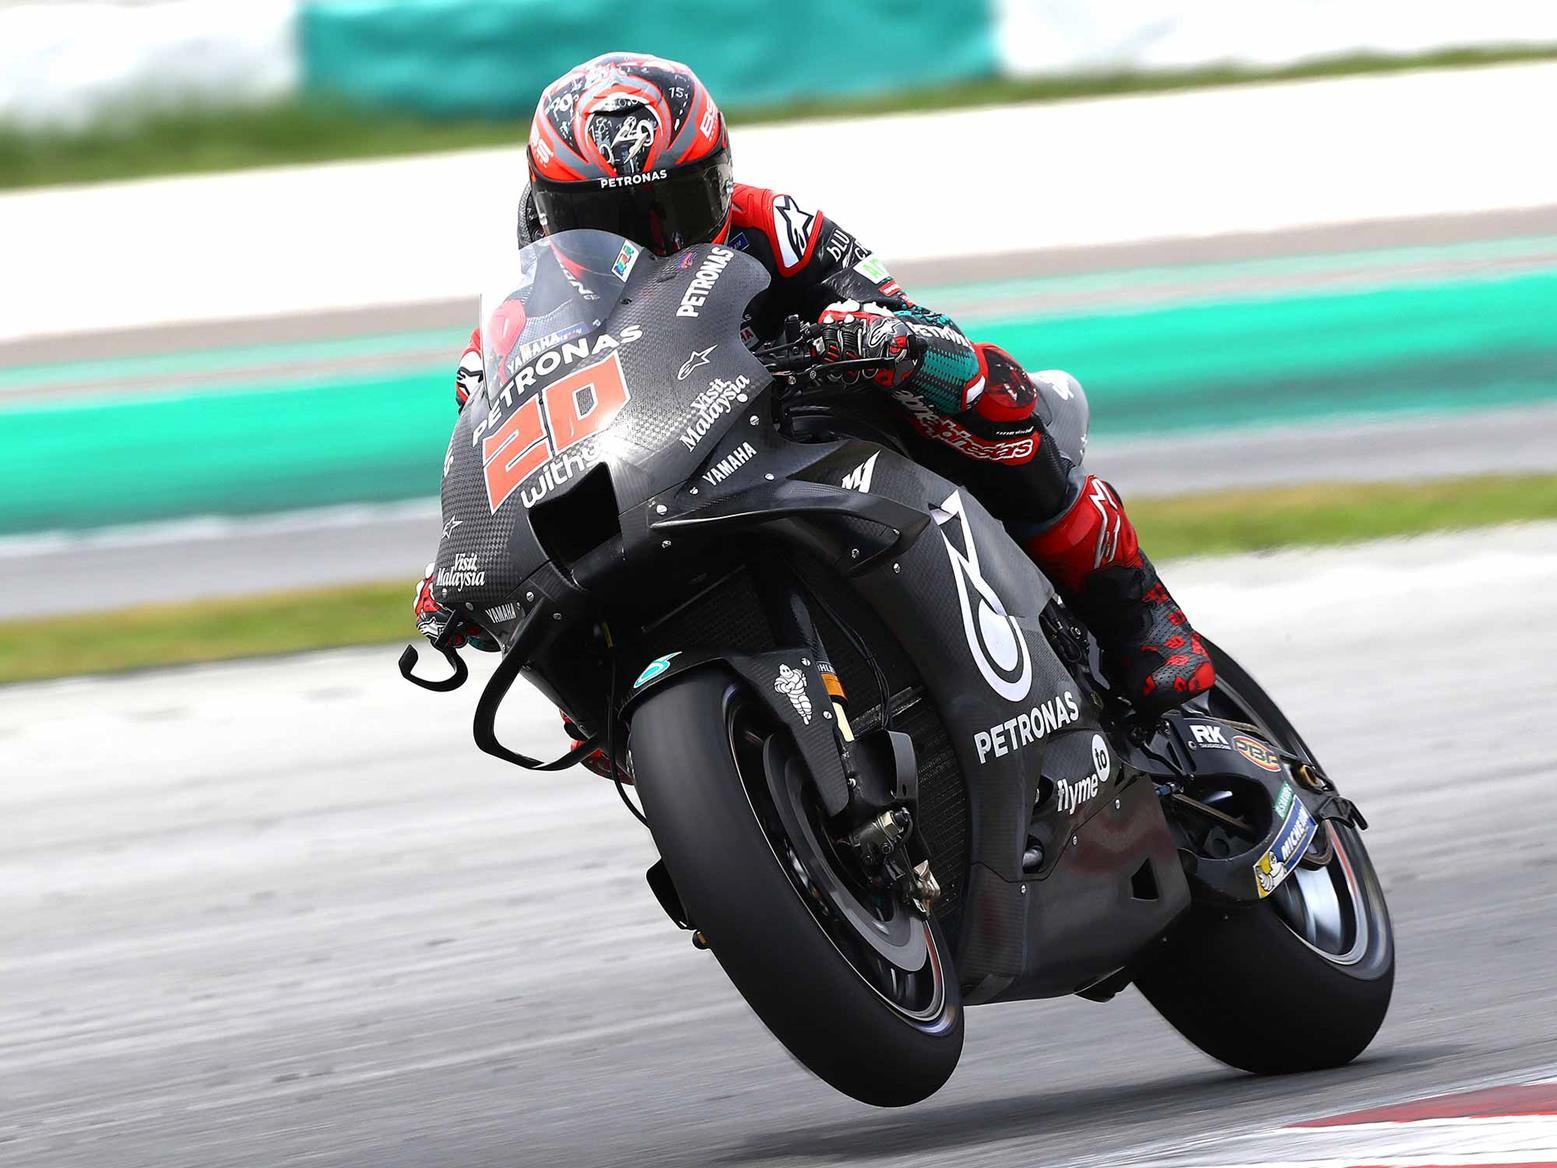 Quartararo tops day two on the 2020 M1